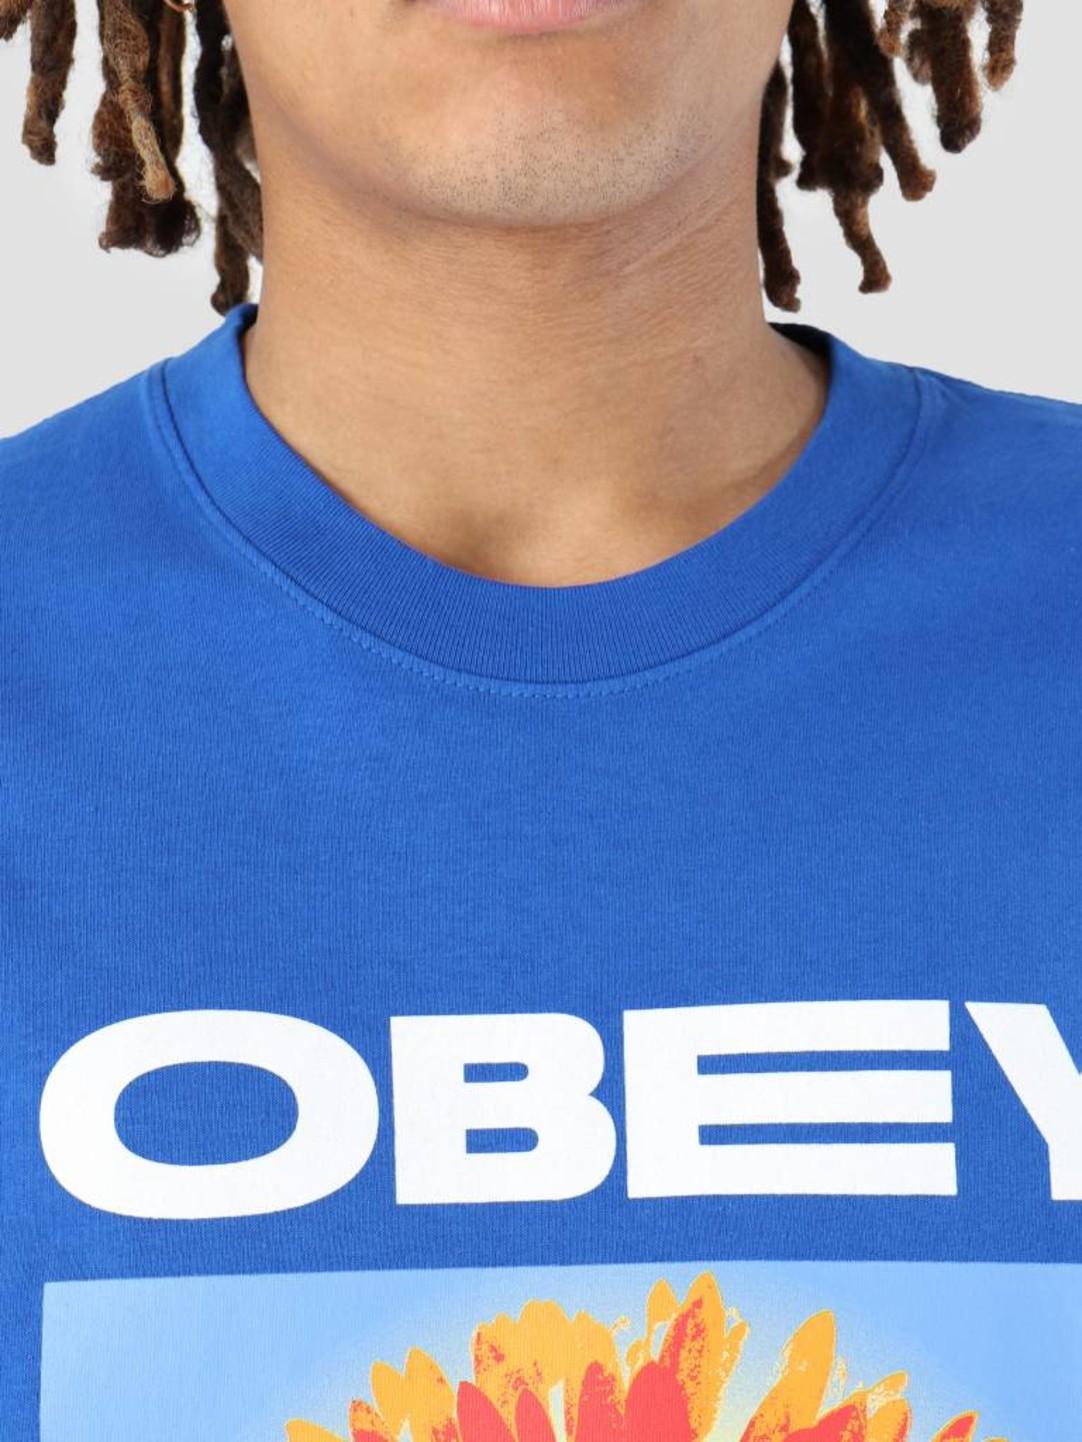 Obey Obey Flower Power T-Shirt Royal blue 166911861-RYL